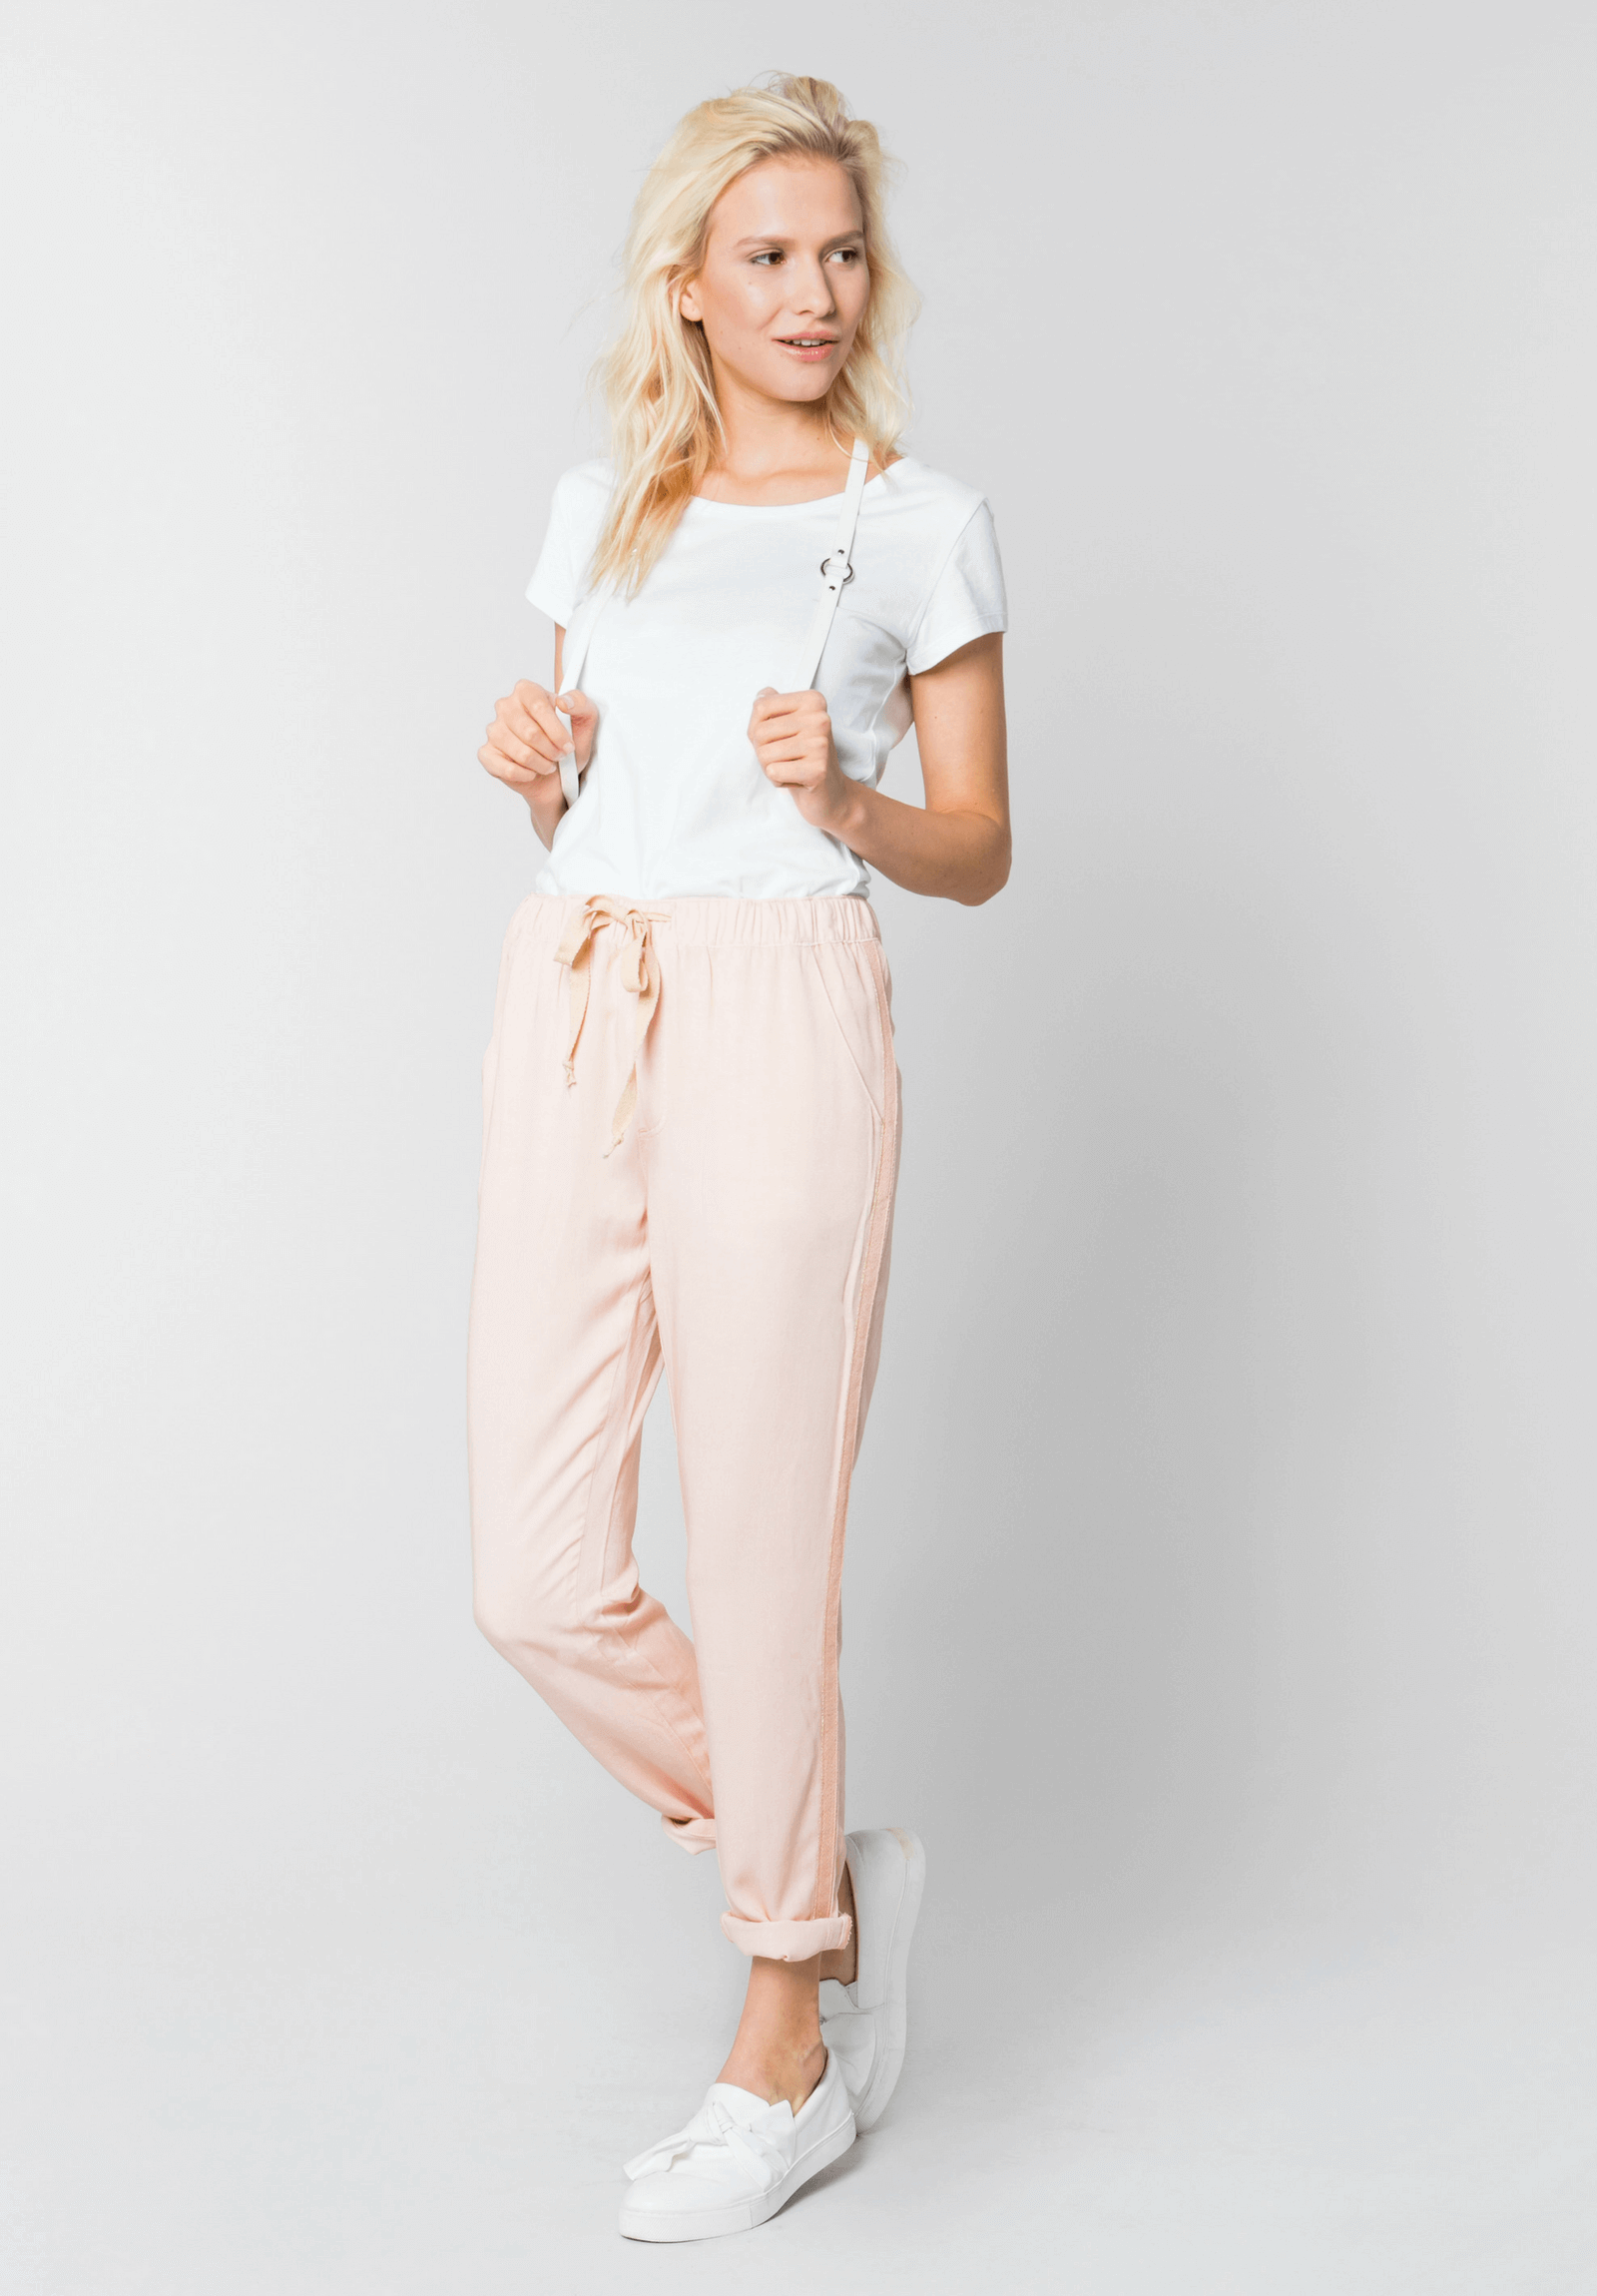 Rosa Weiß Style